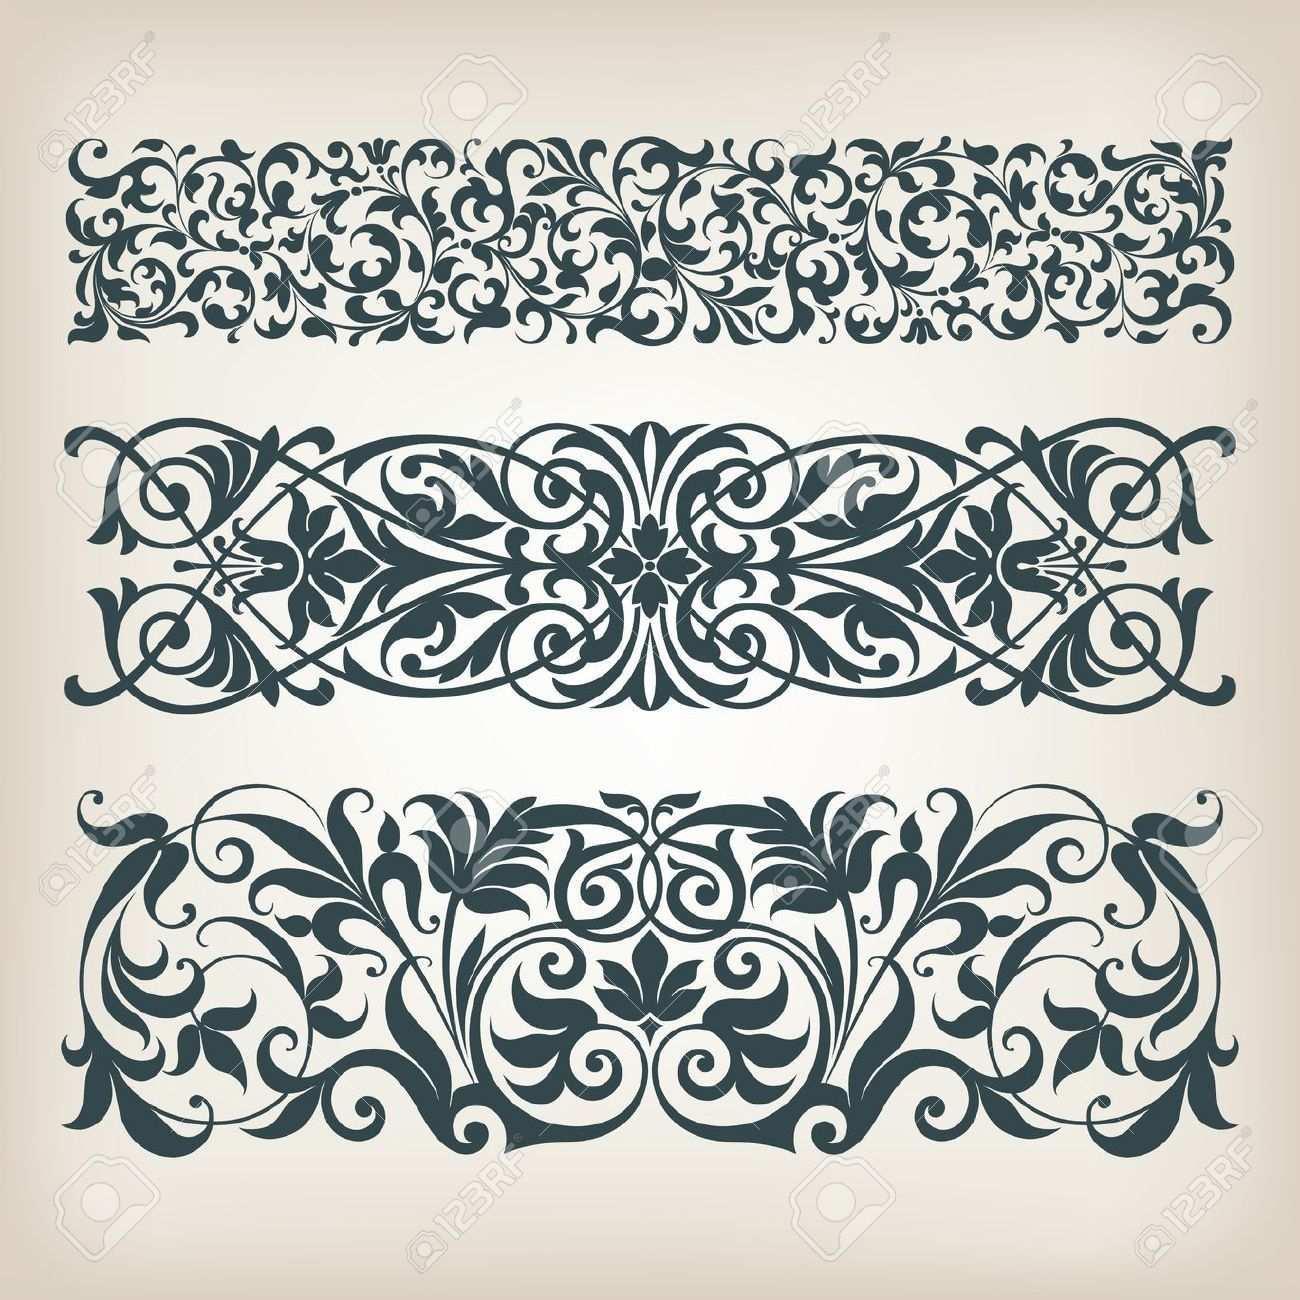 Vektor Set Vintage Verzierten Bordurenrahmen Filigran Mit Retro Muster Im Antiken Barocken Stil Arabische Kalligr Ornamente Vorlagen Barock Muster Retro Muster